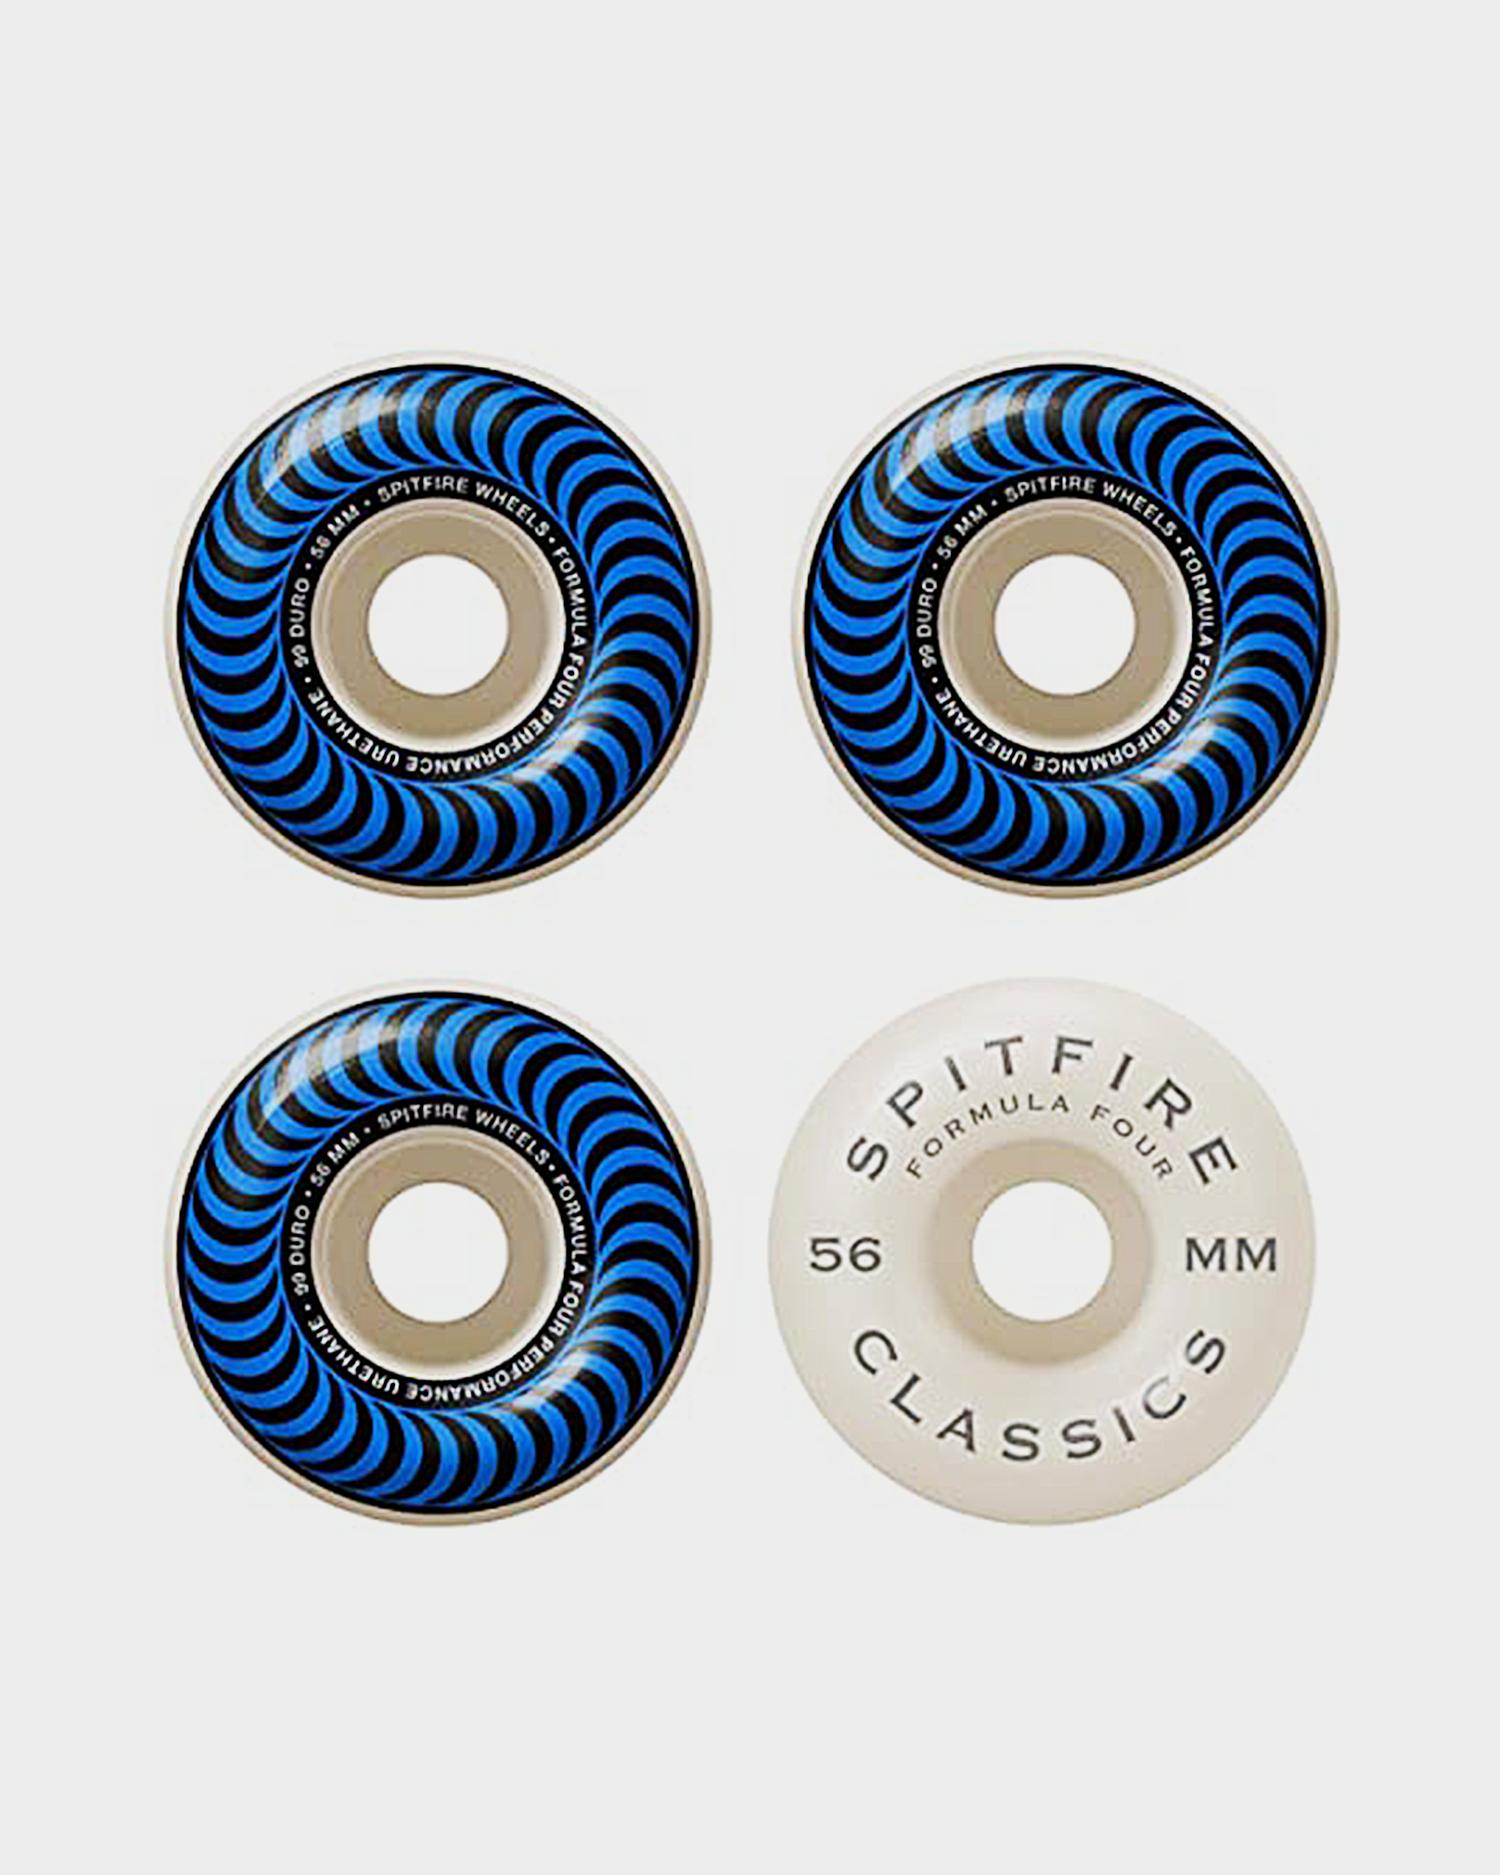 Spitfire Wheels F4 99 Classic Blue 56mm